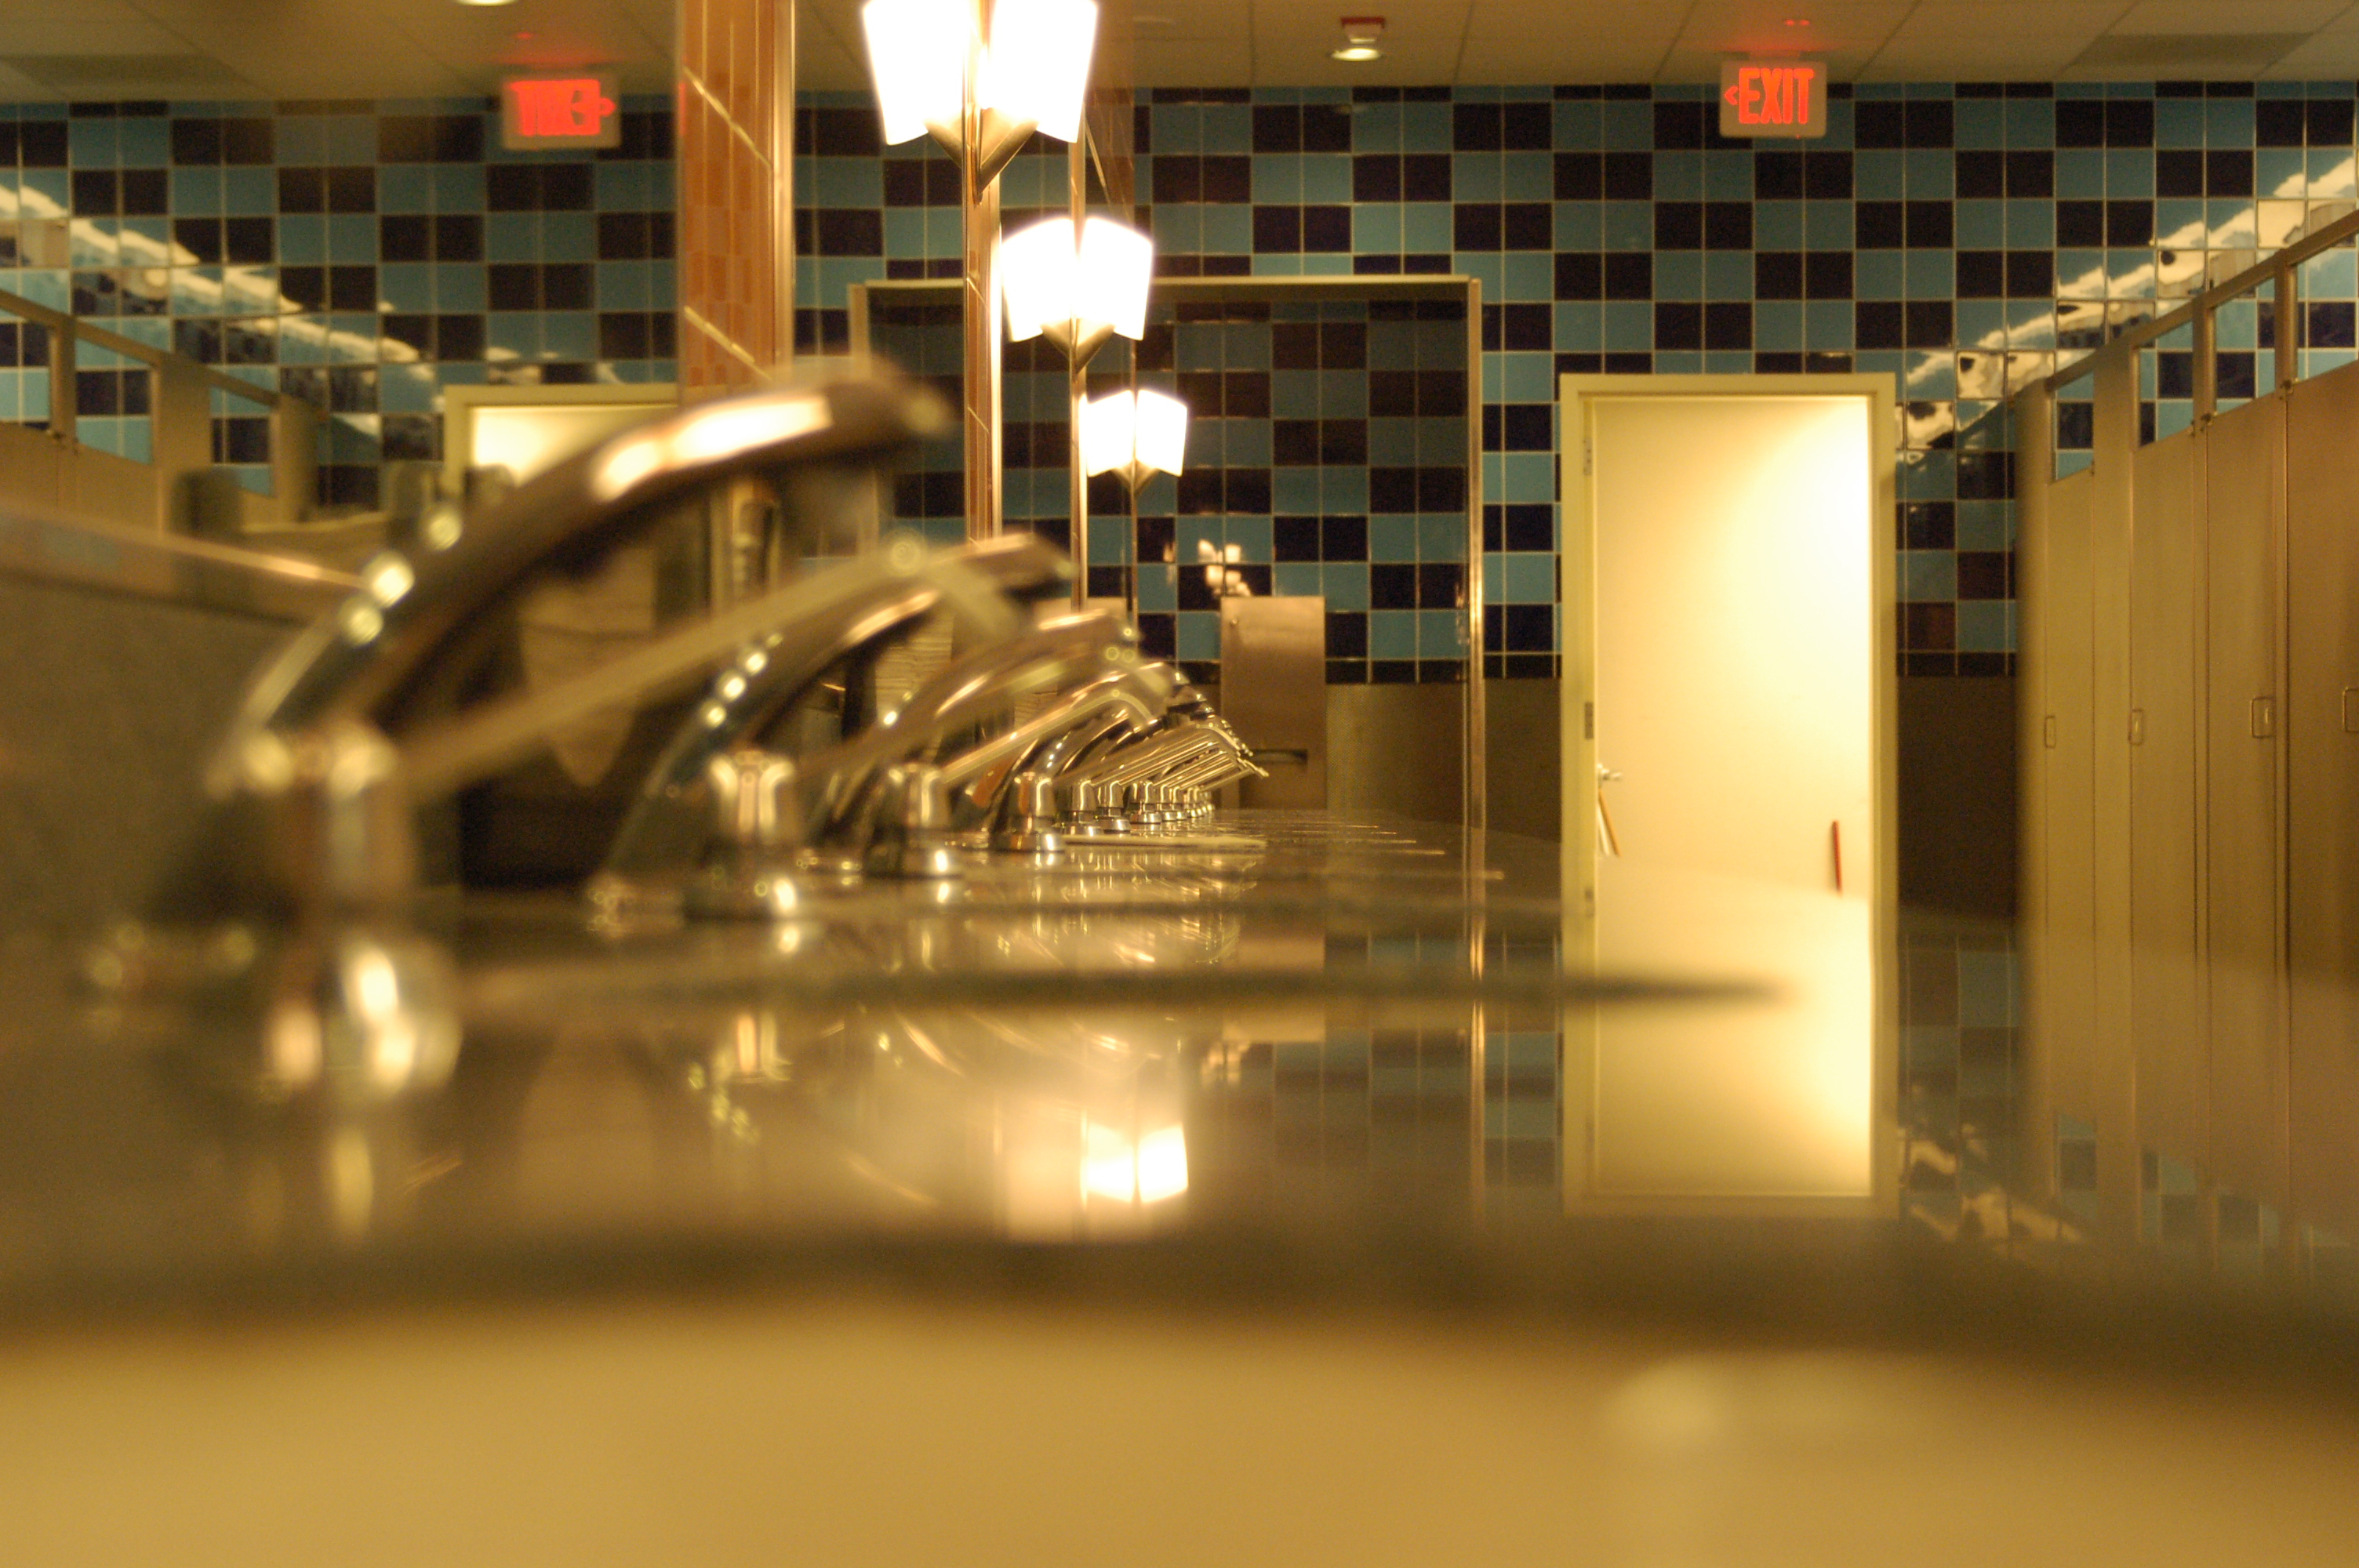 Rest room, Angle, Bathroom, Doors, Light, HQ Photo